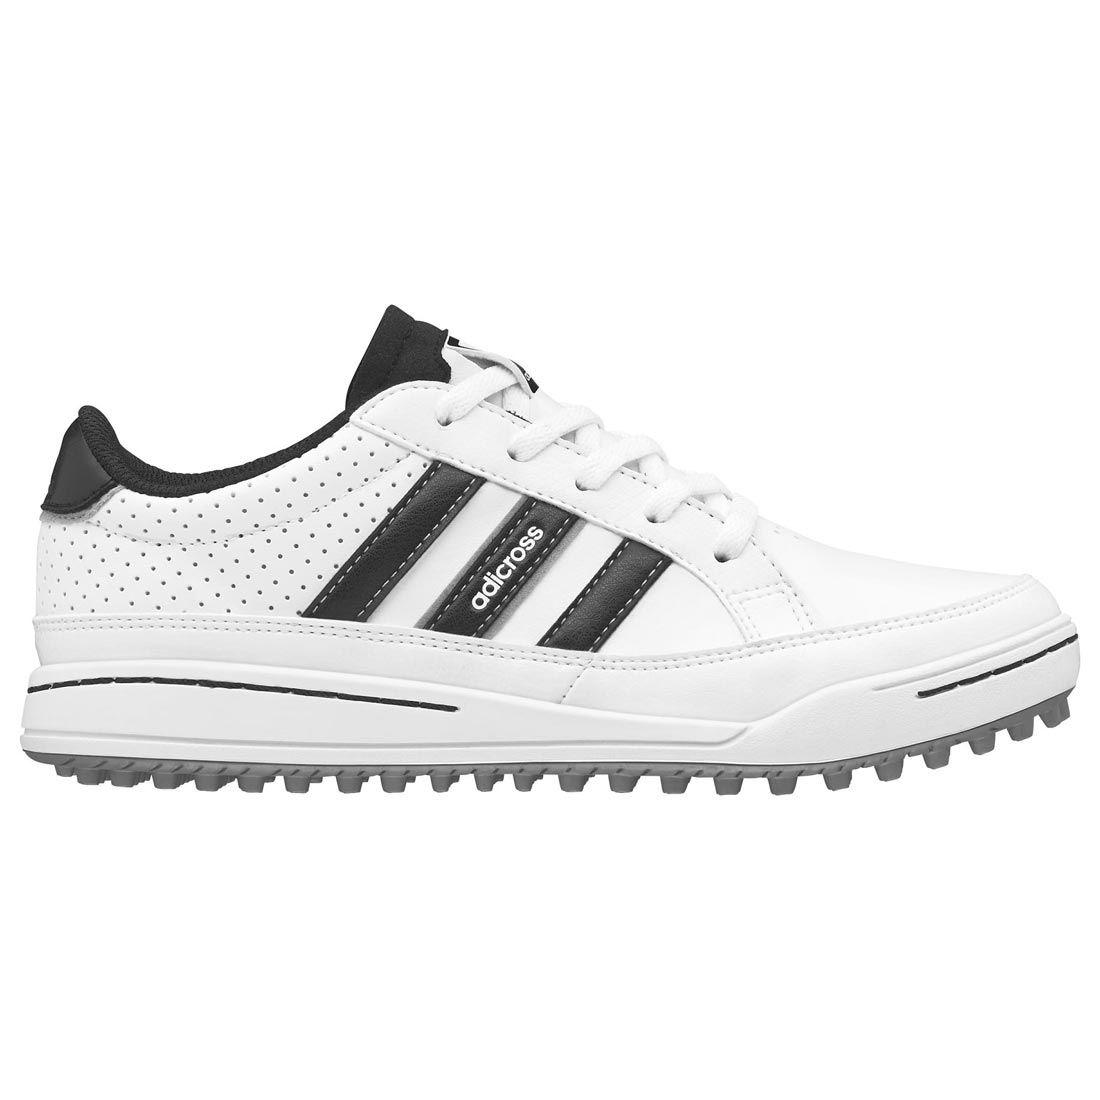 Buy Adidas adiCross IV Junior Golf